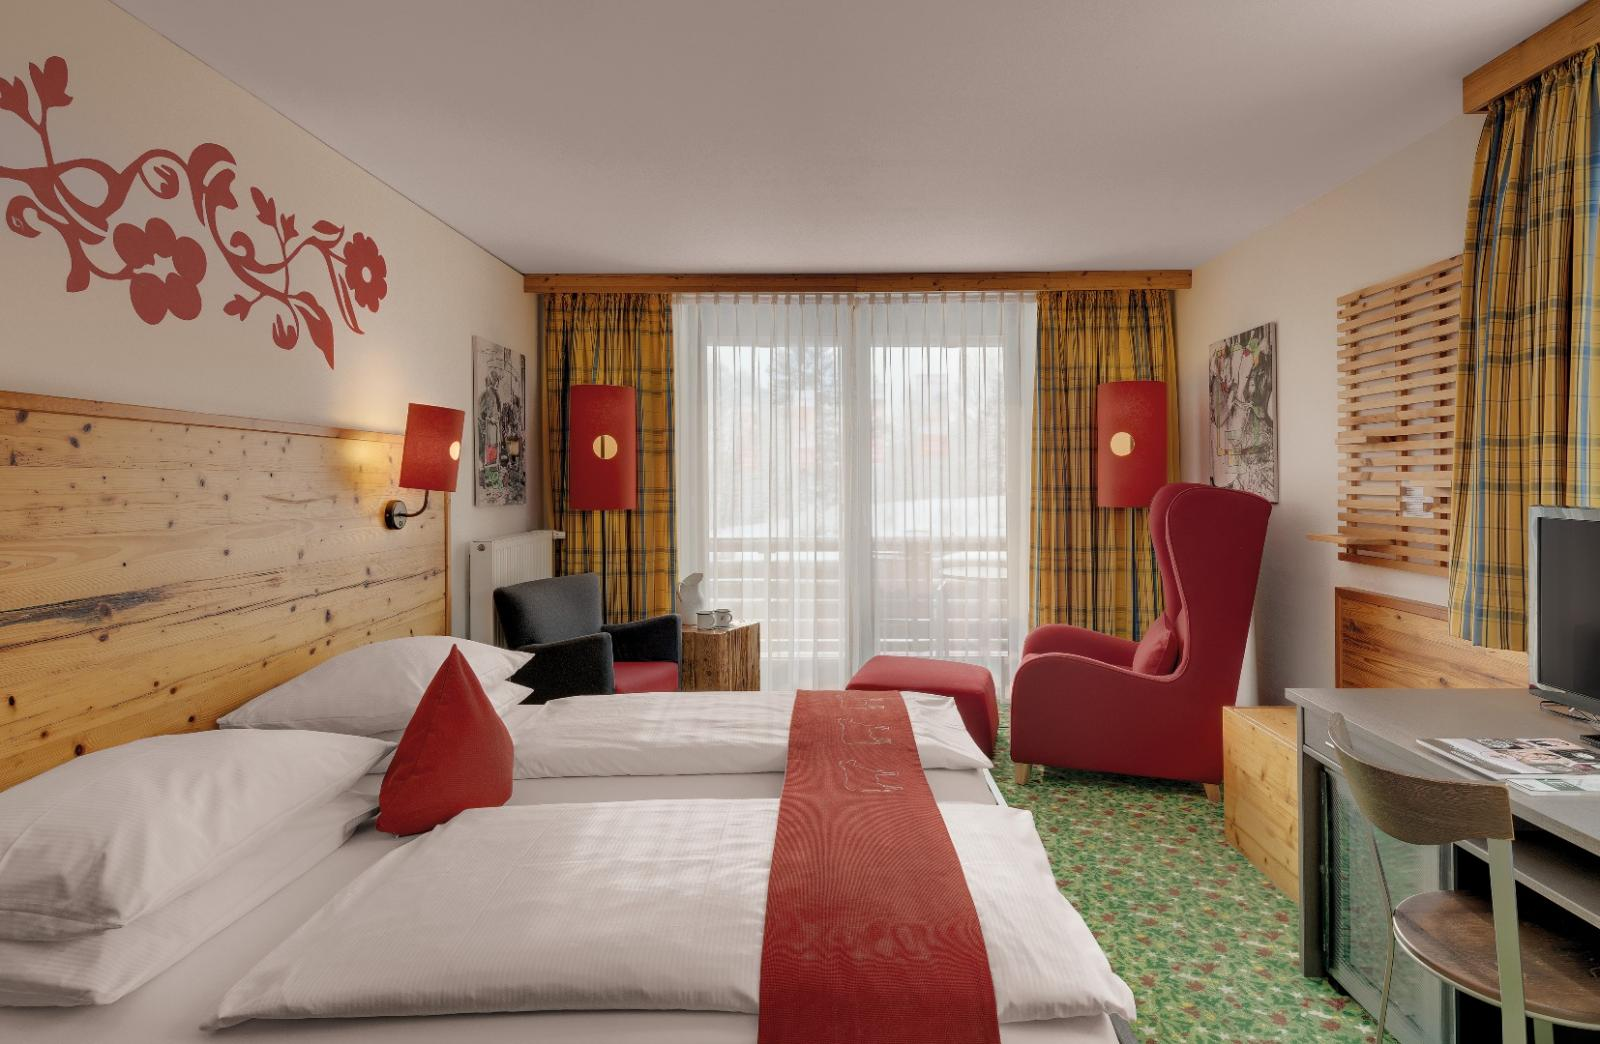 Homöopathie: Foto vom Wellnesshotel Hotel Oberstdorf | Wellness Bayern